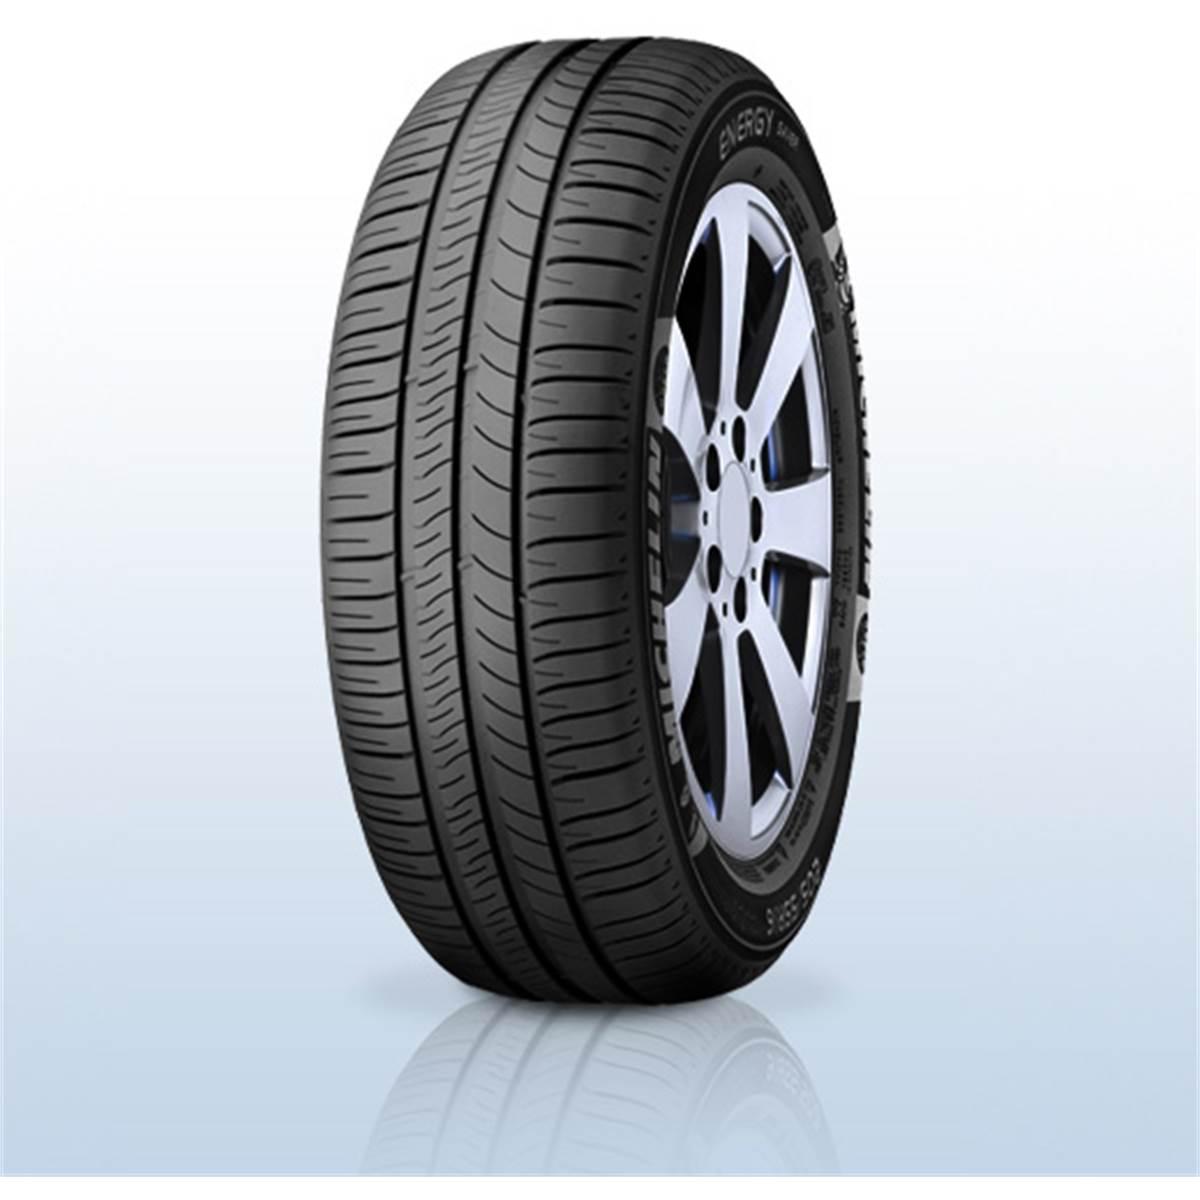 Pneu Michelin 215/65R15 96T Energy Saver +